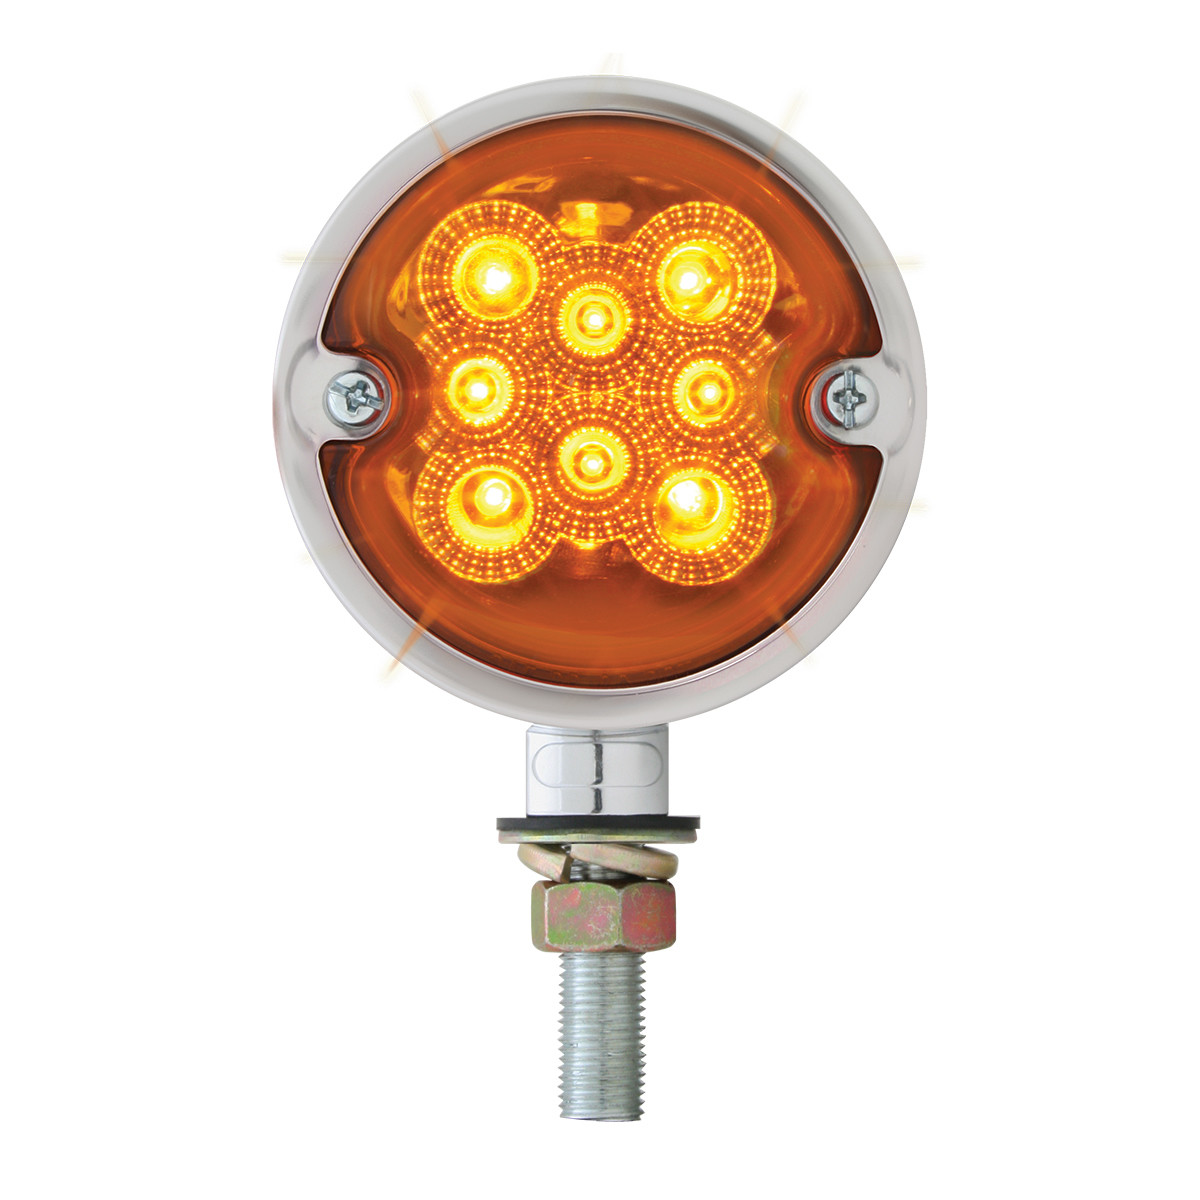 Double Face Spyder LED Pedestal Light